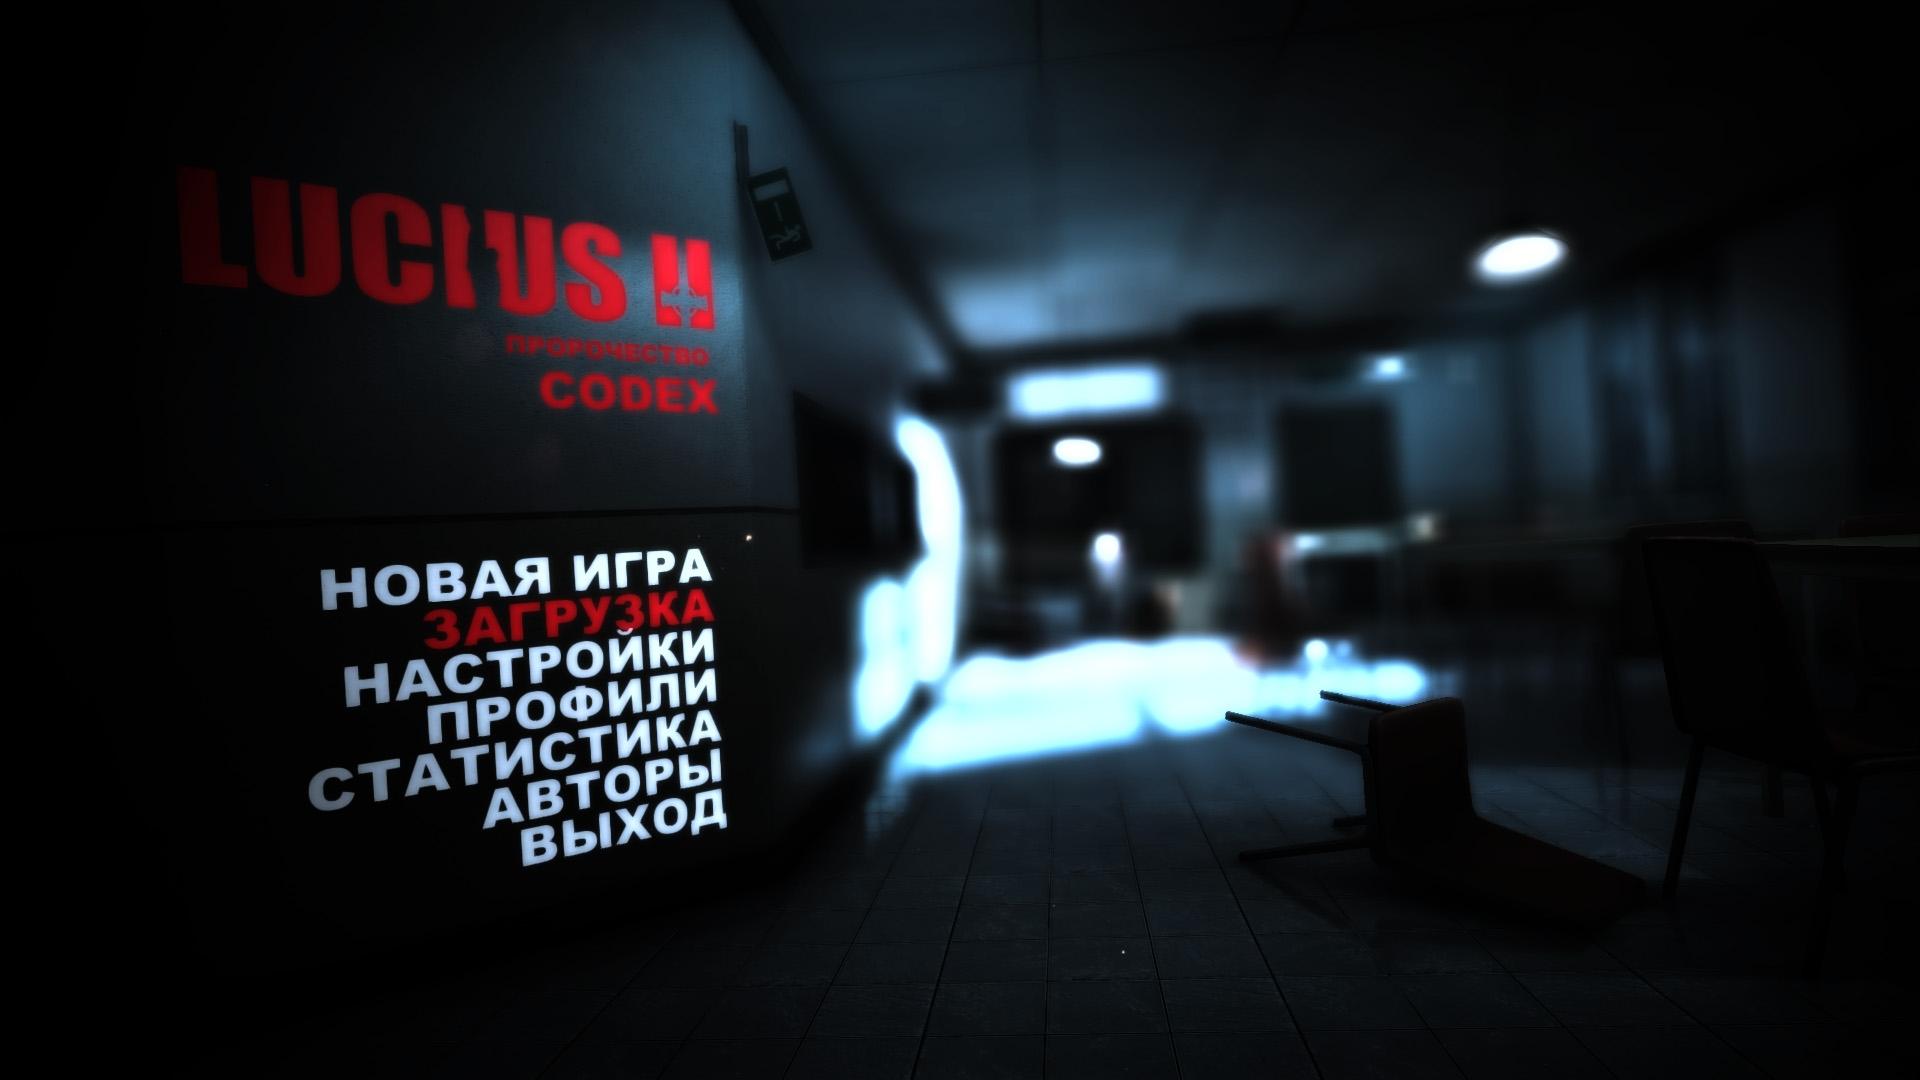 Lucius II: The Prophecy 2015 RePack от xGhost скачать торрент